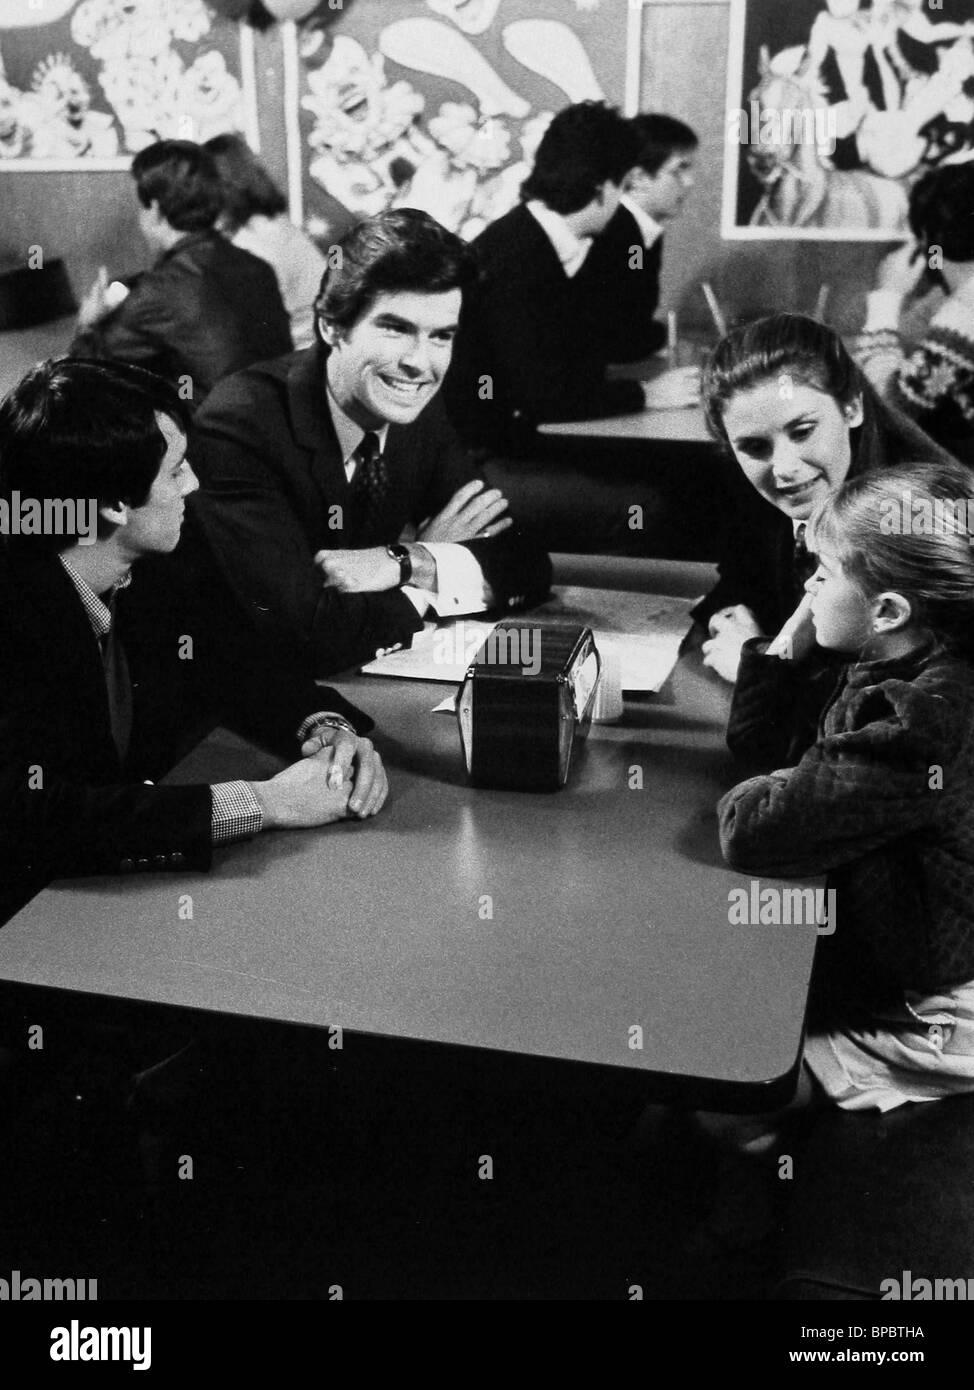 ERIC BROWN, PIERCE BROSNAN, STEPHANIE ZIMBALIST, BRIDGETTE ANDERSEN, REMINGTON STEELE, 1982 Stock Photo